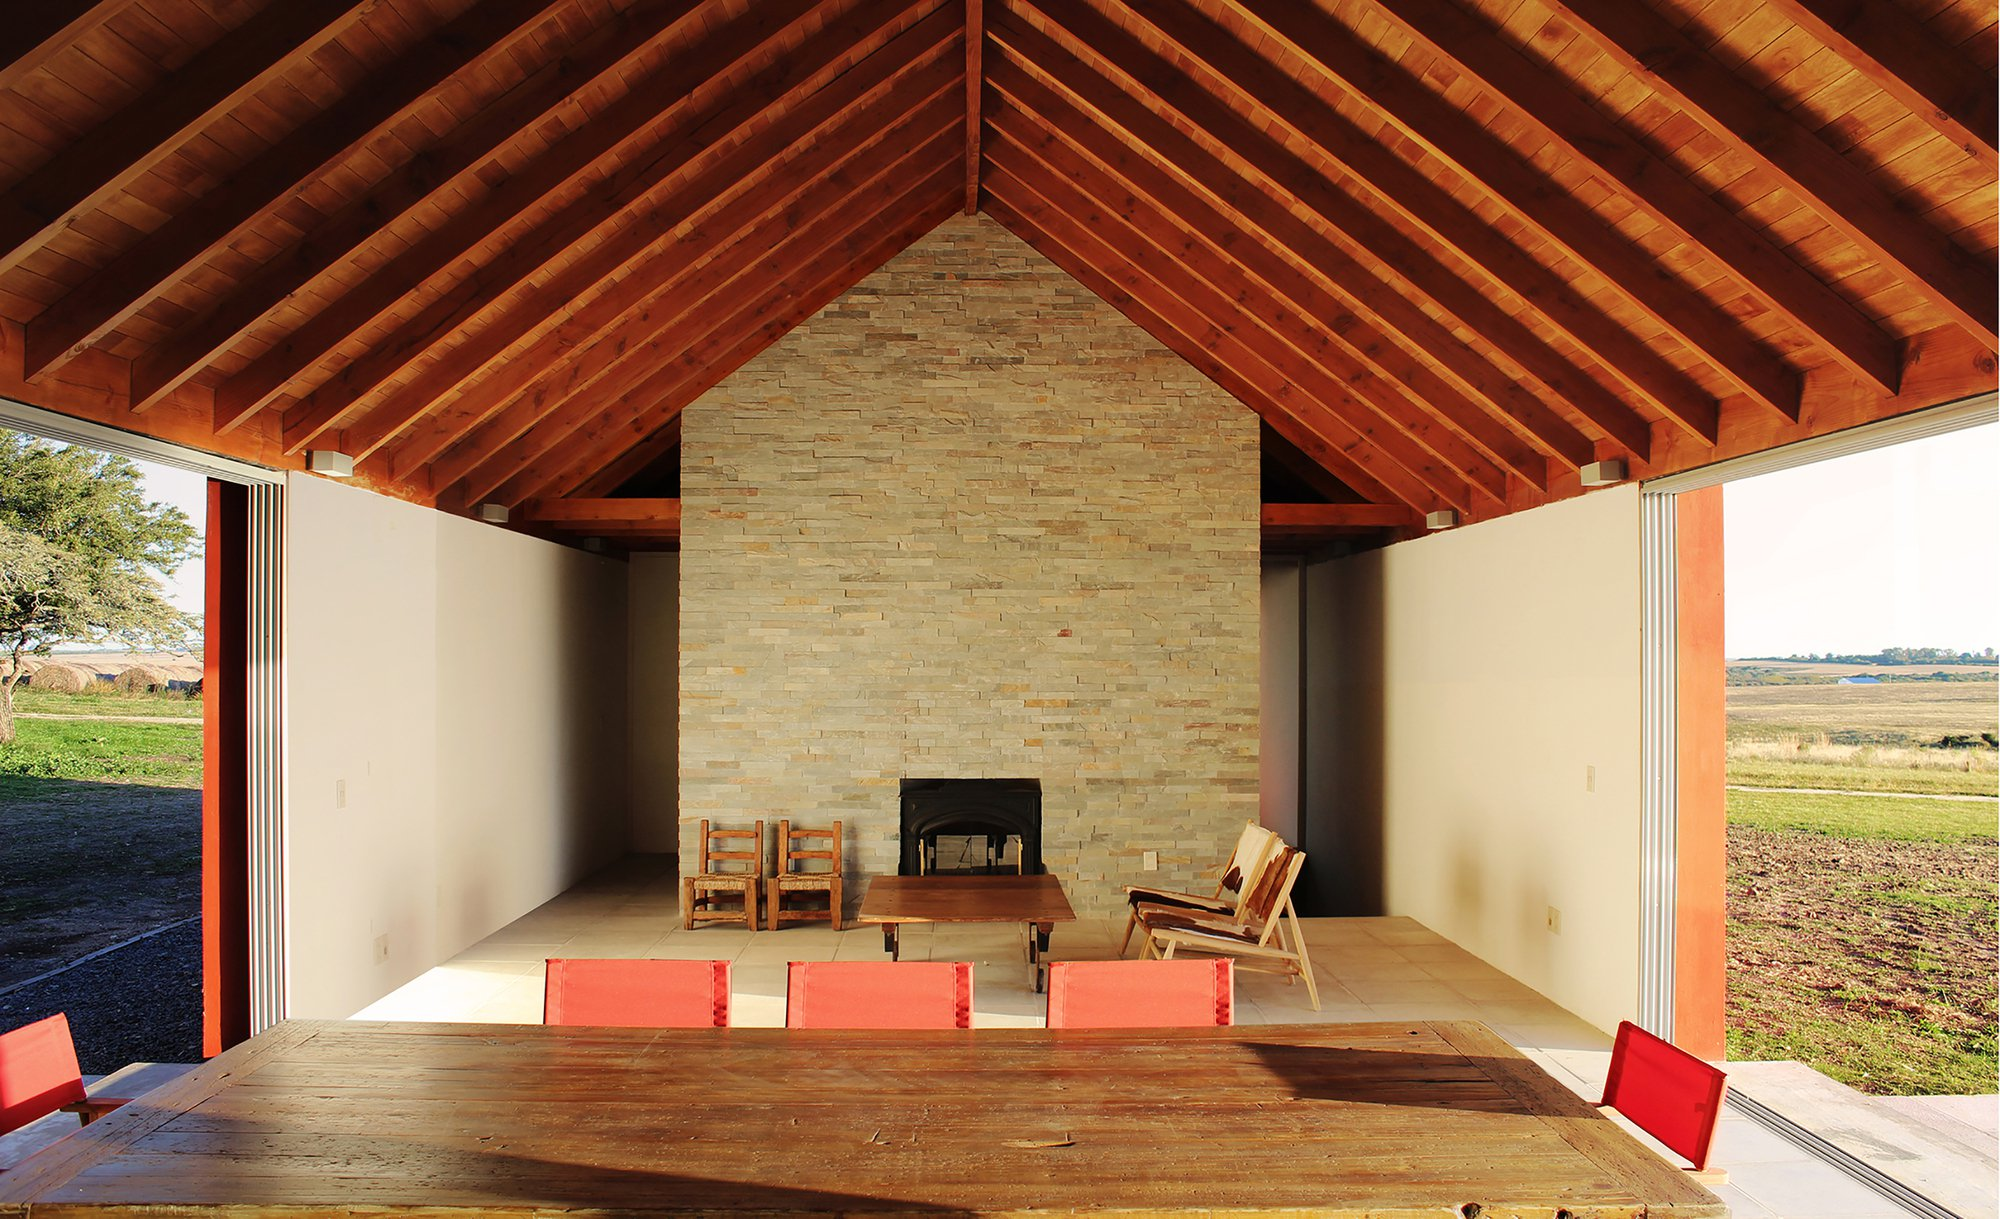 Exquisite simplicity La Lunera House, Soriano - Uruguay - the vandallist (8)